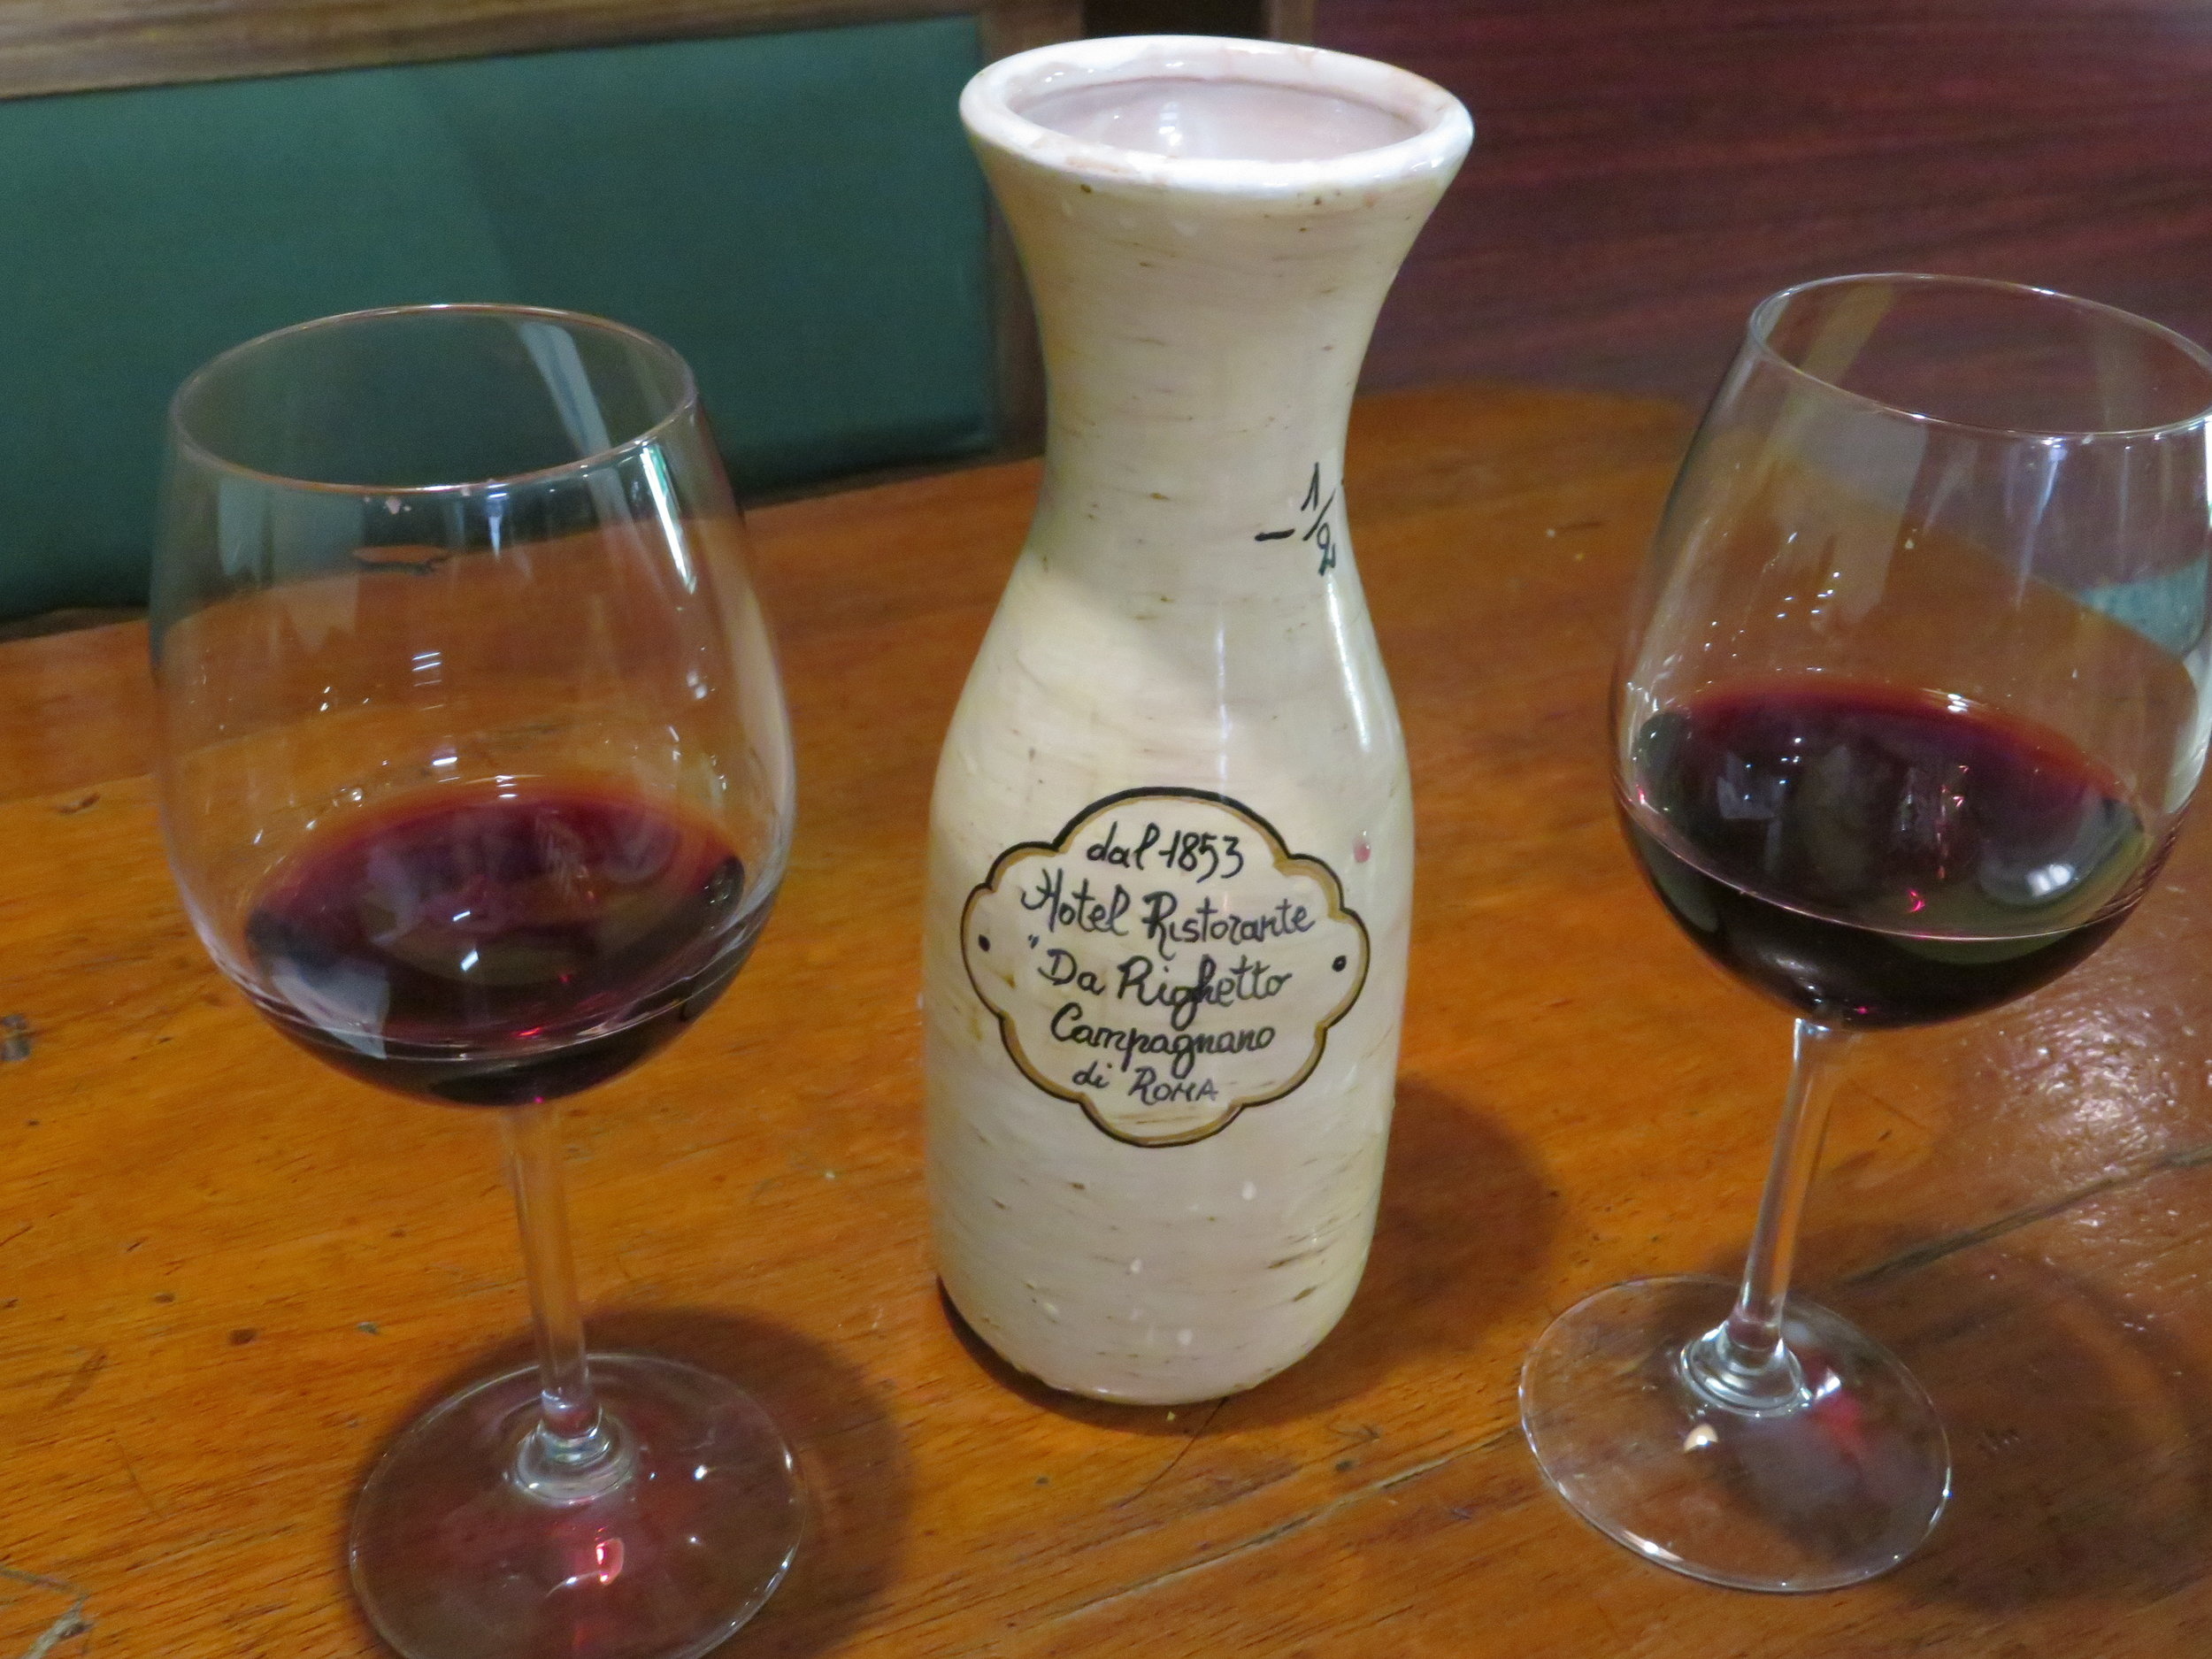 A half liter of fine house wine